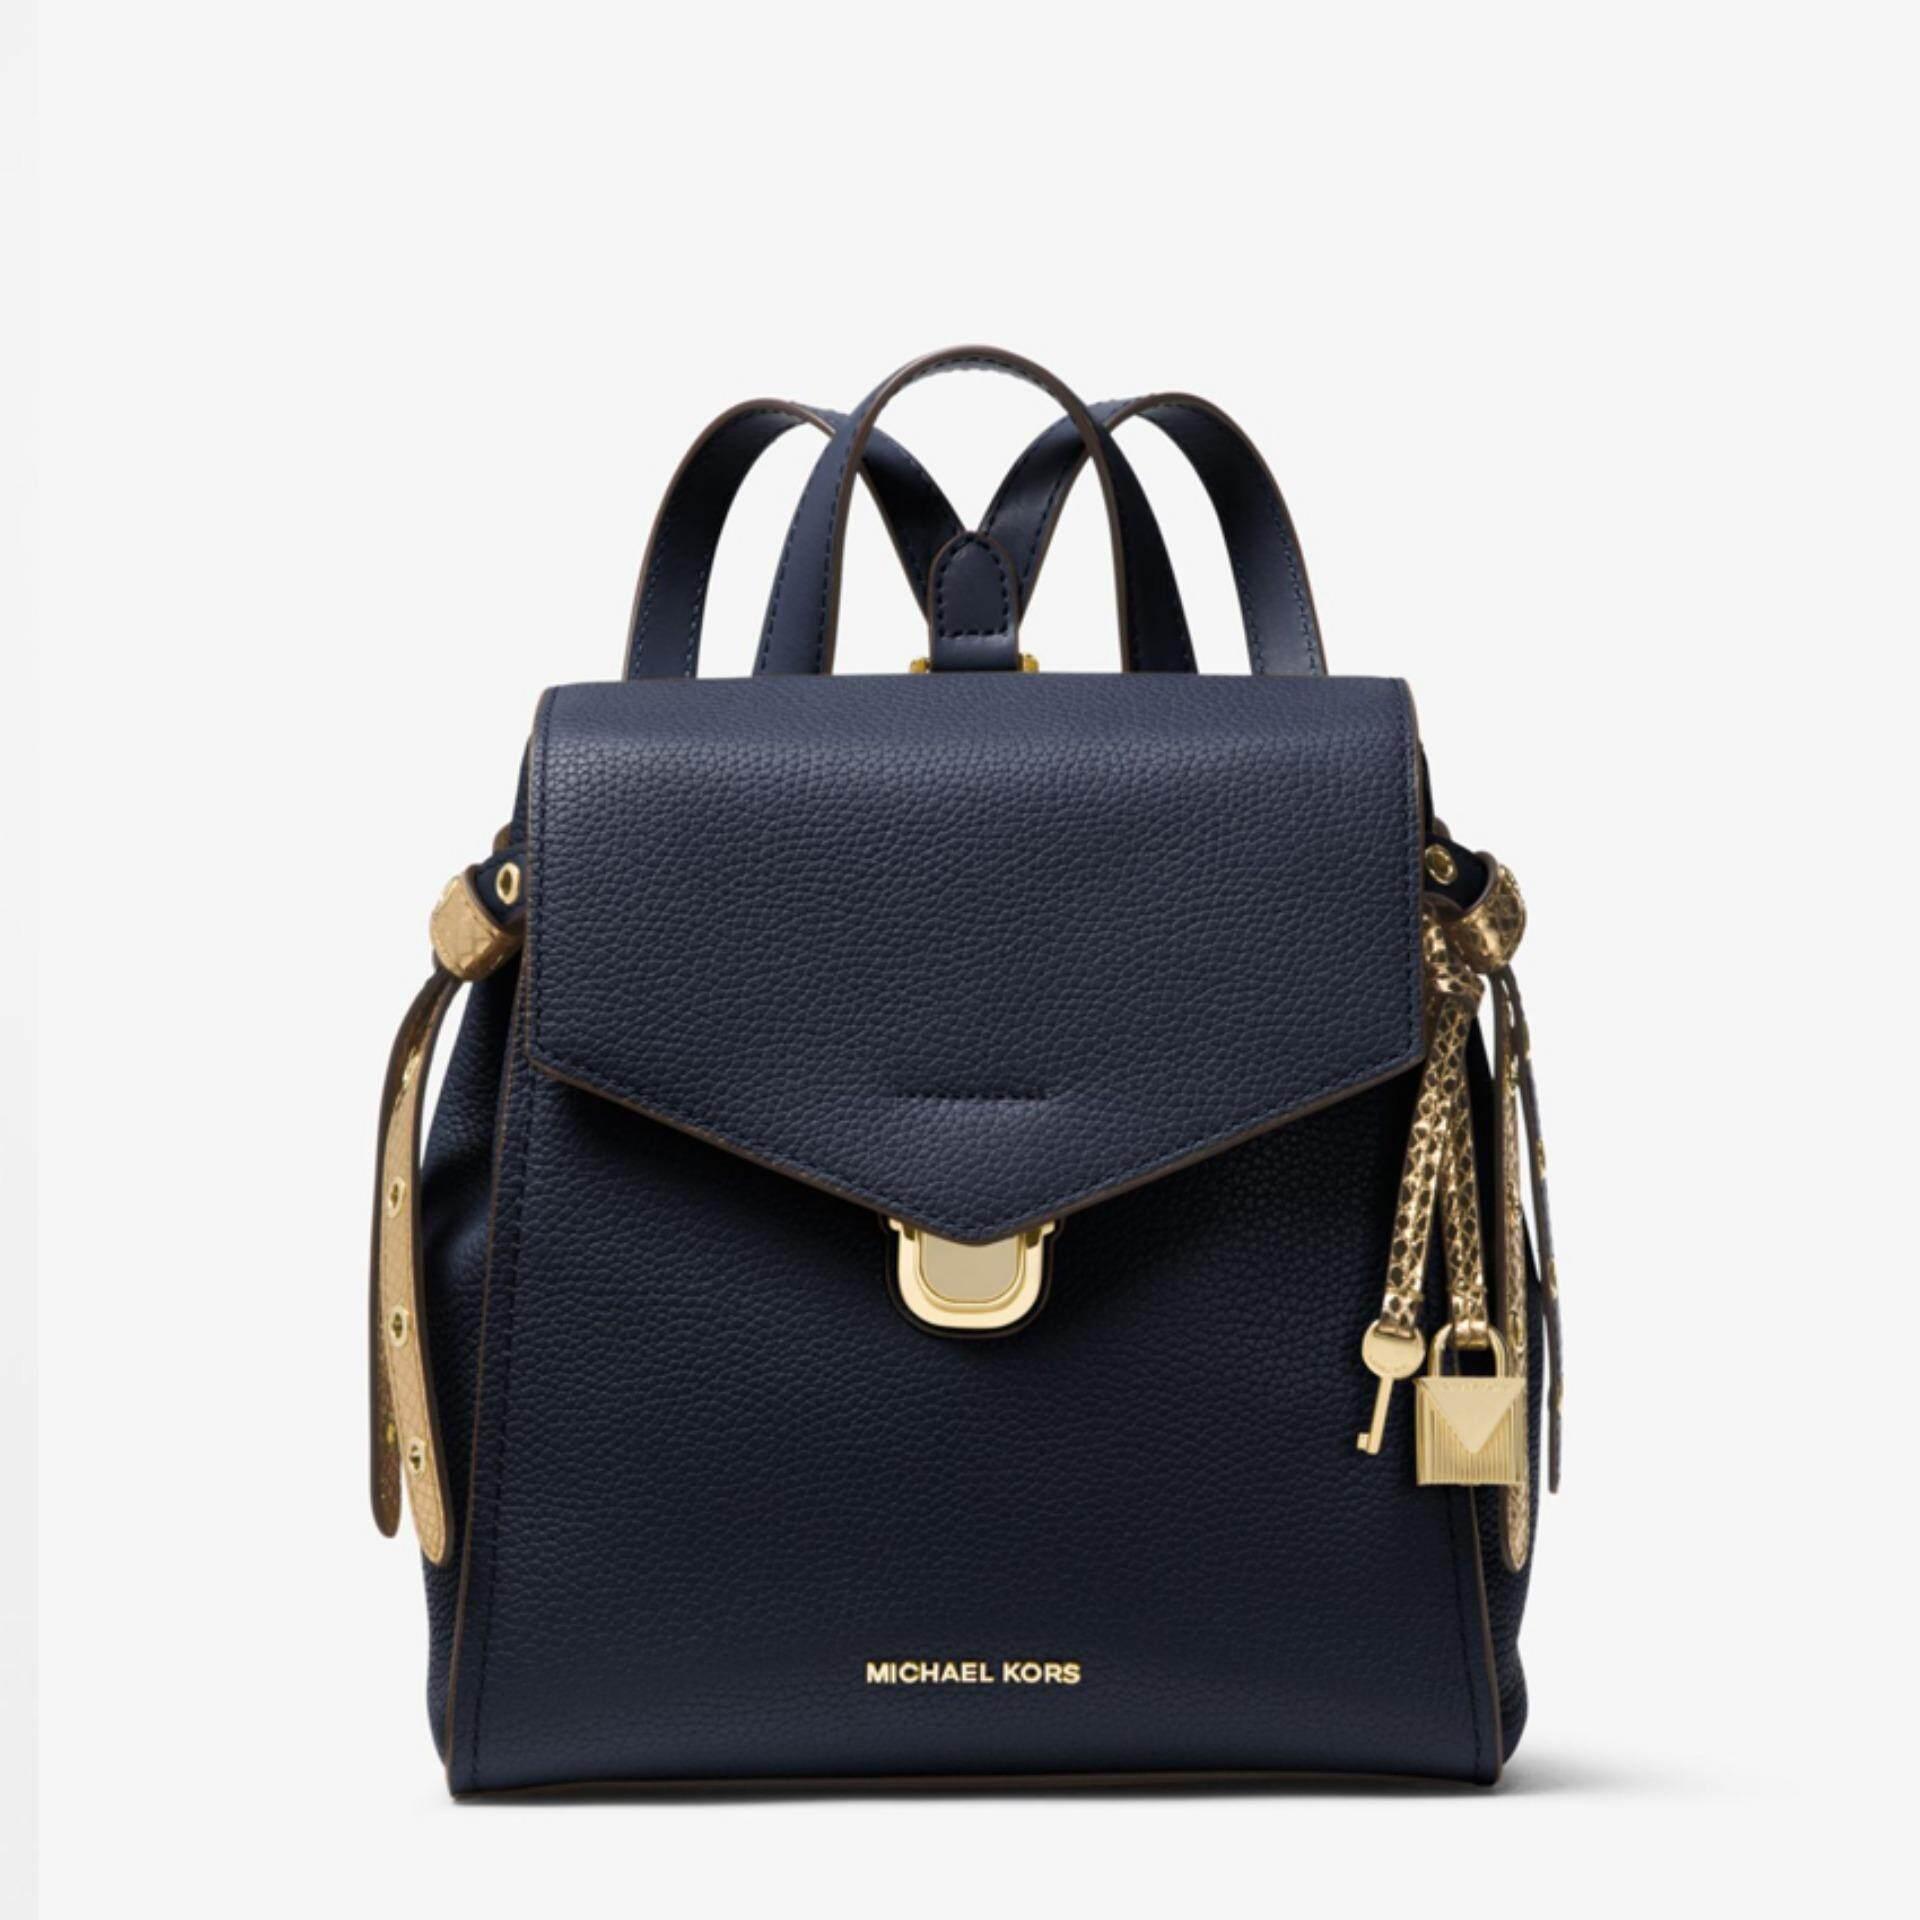 2b0c5cc90db1e5 Michael Kors Bristol Small Leather Backpack - Navy Blue